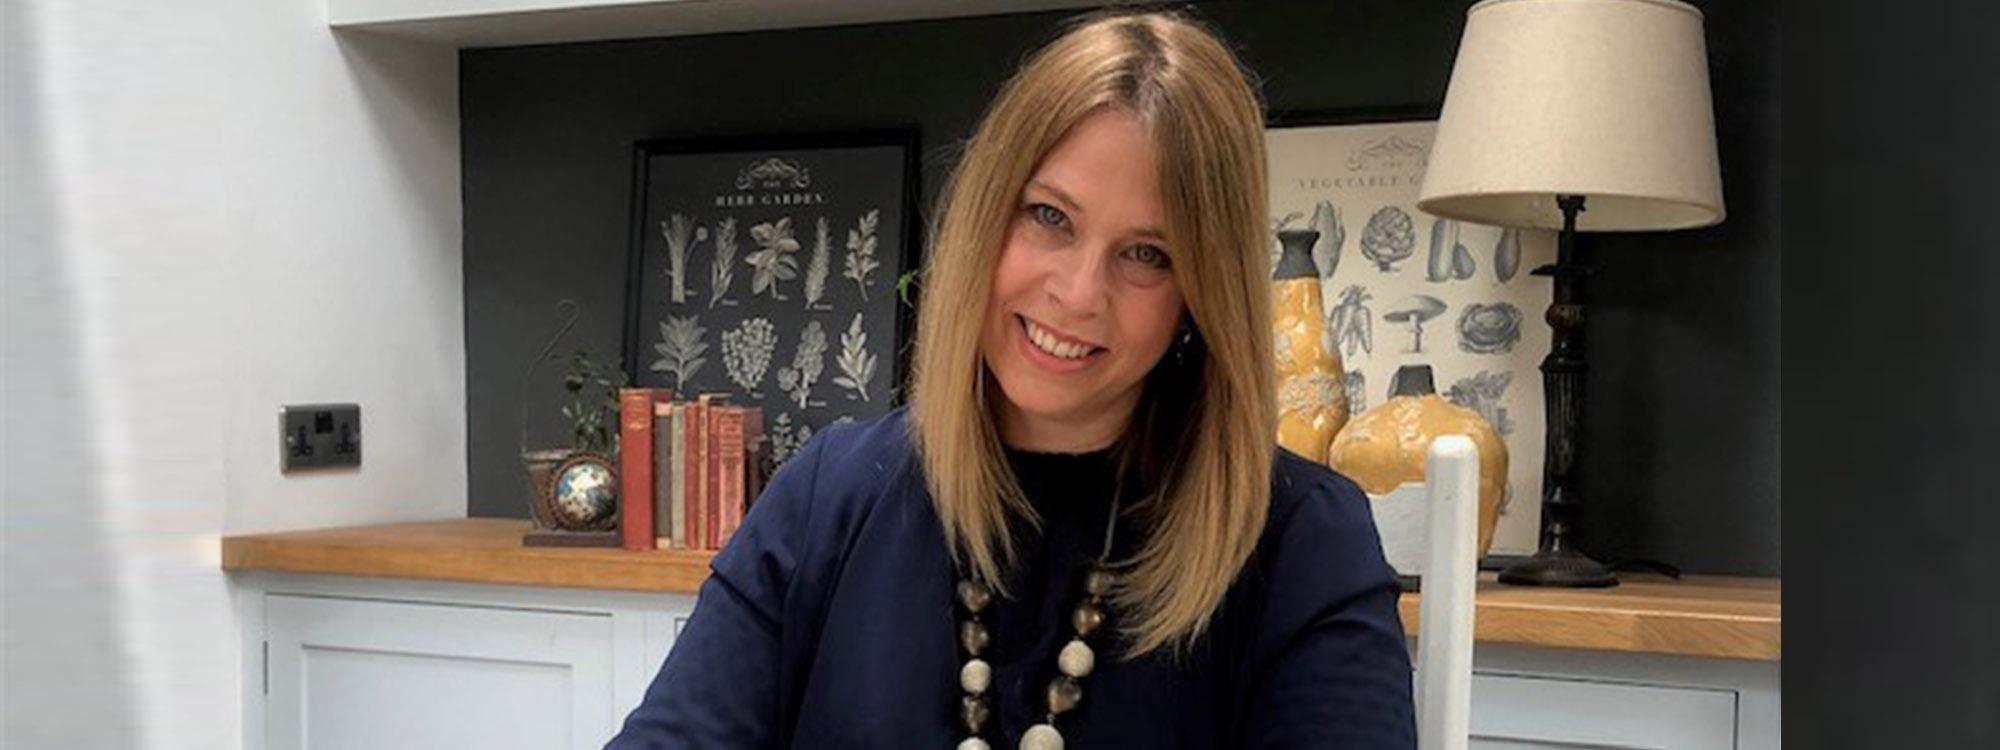 Belinda van Zyl - The road to brave decisions